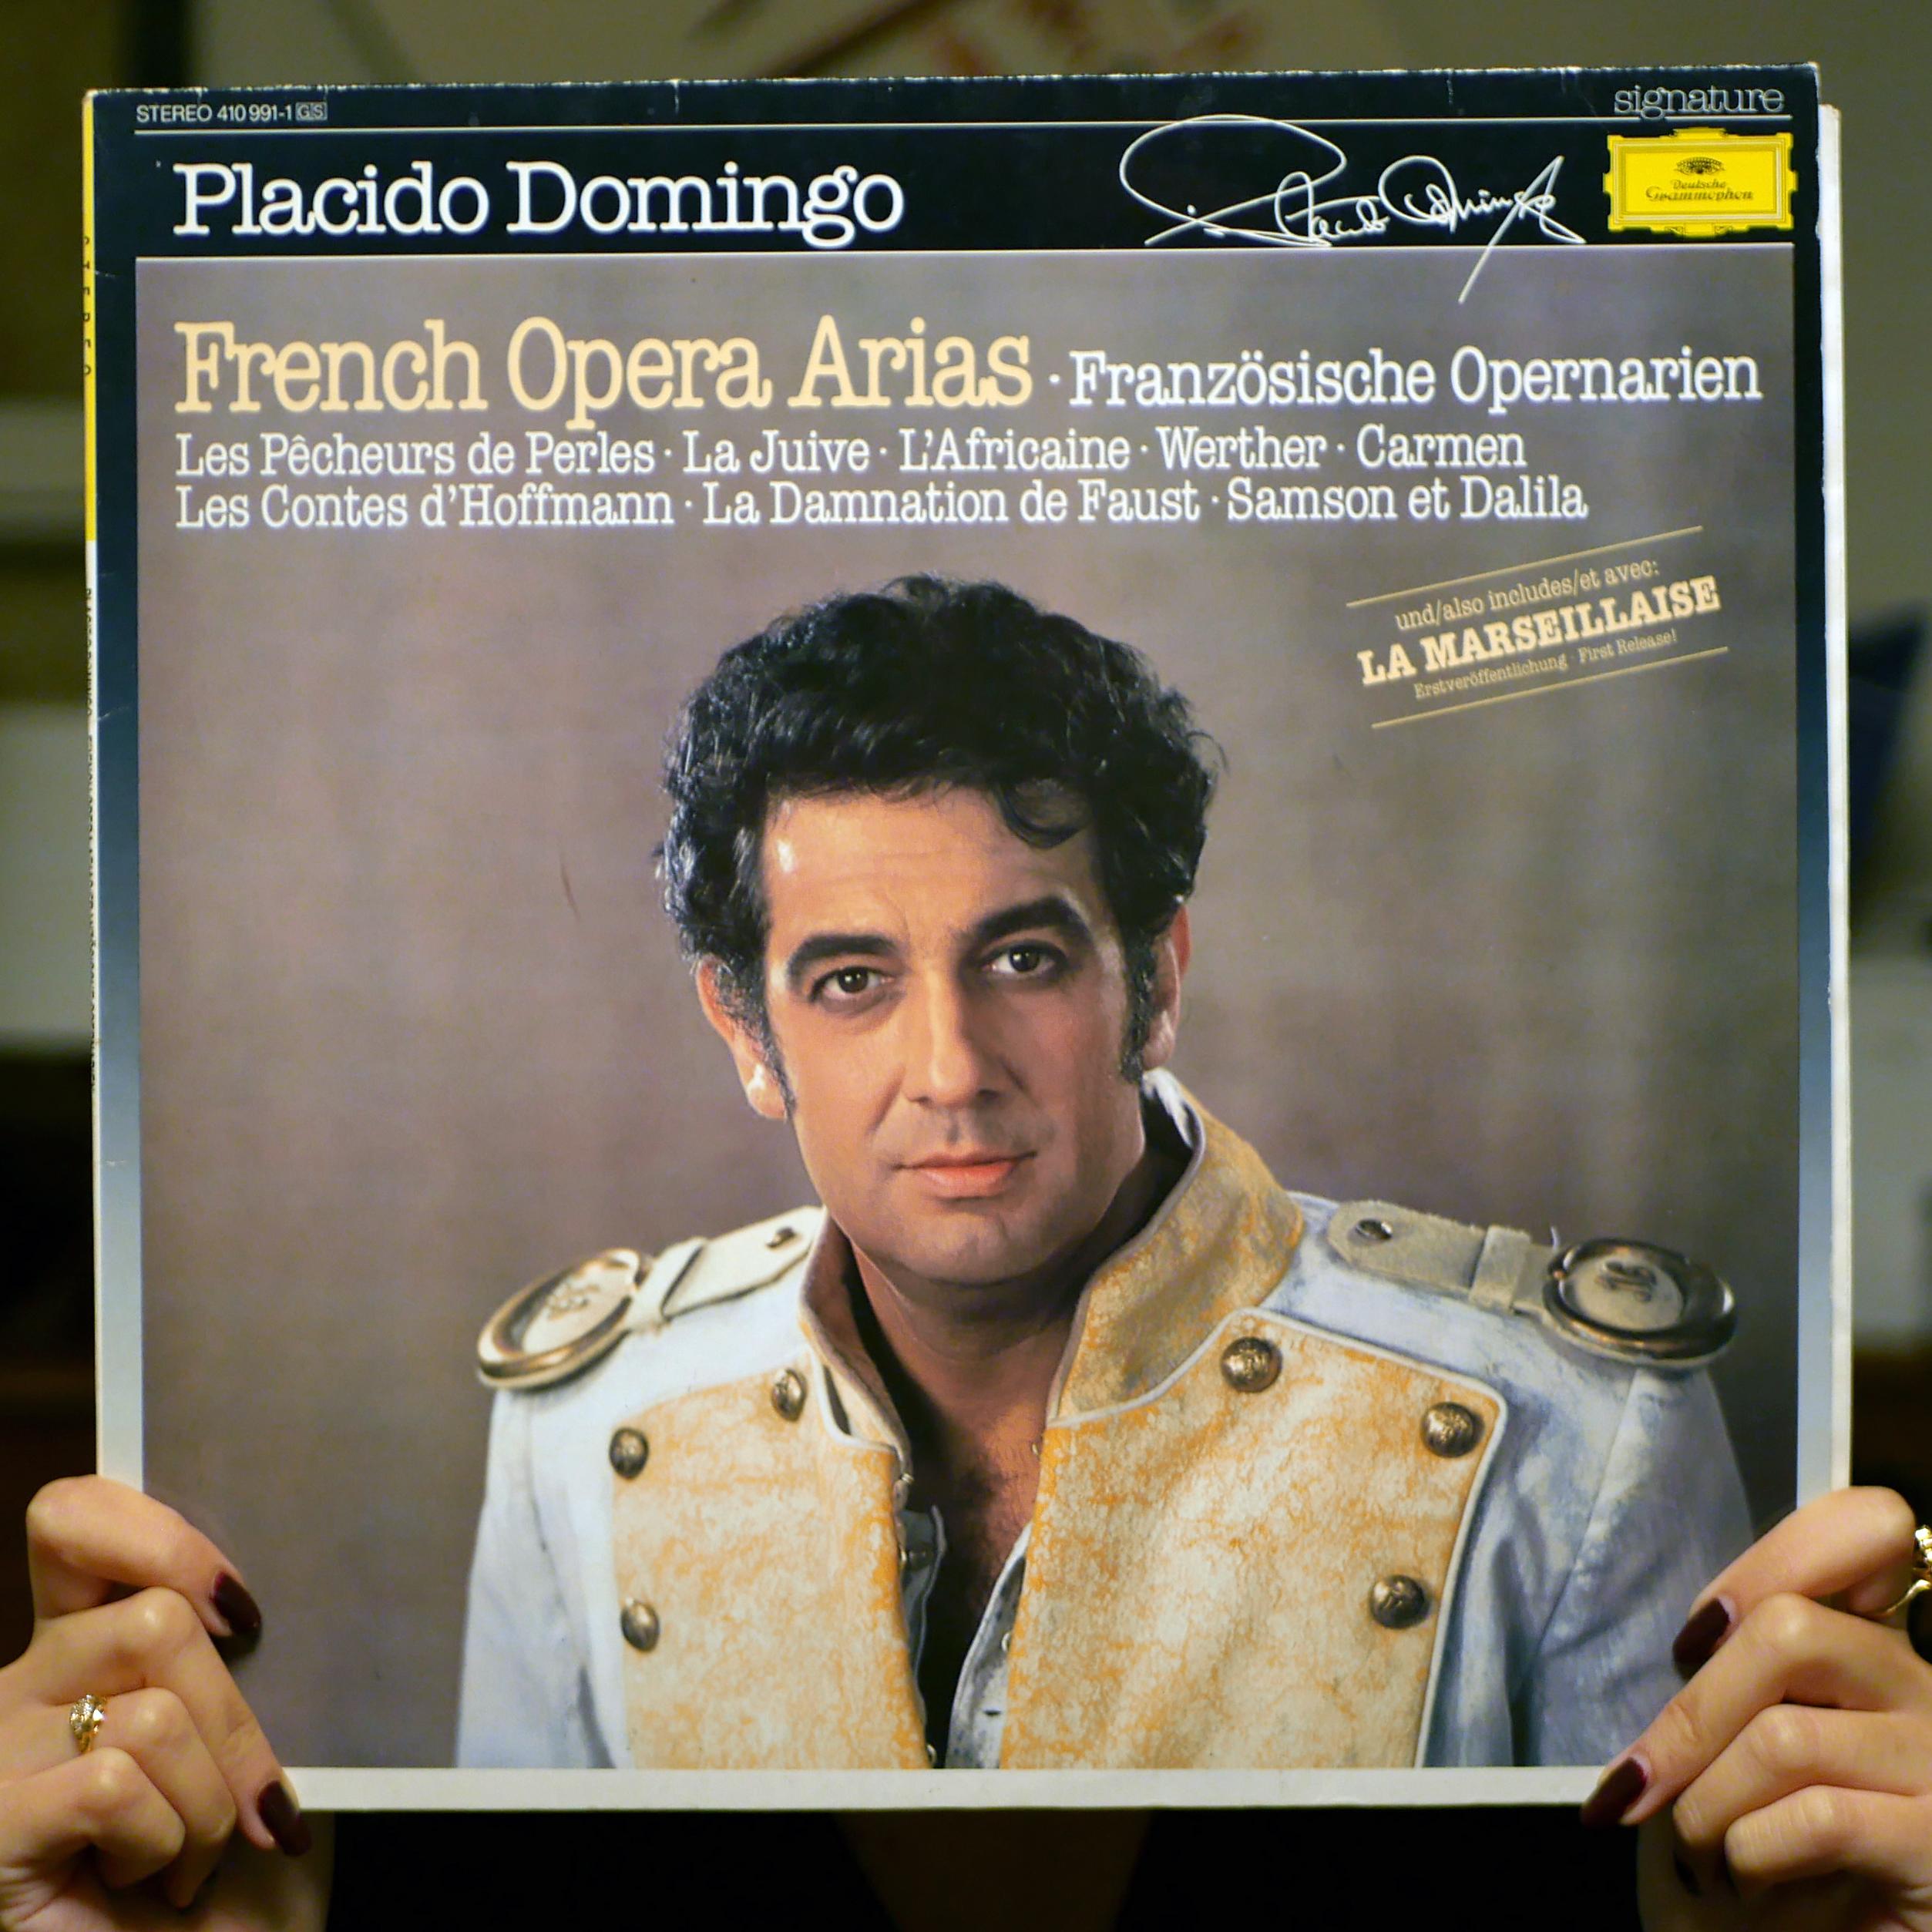 Placido Domingo – French Opera Arias [LP, 1985]